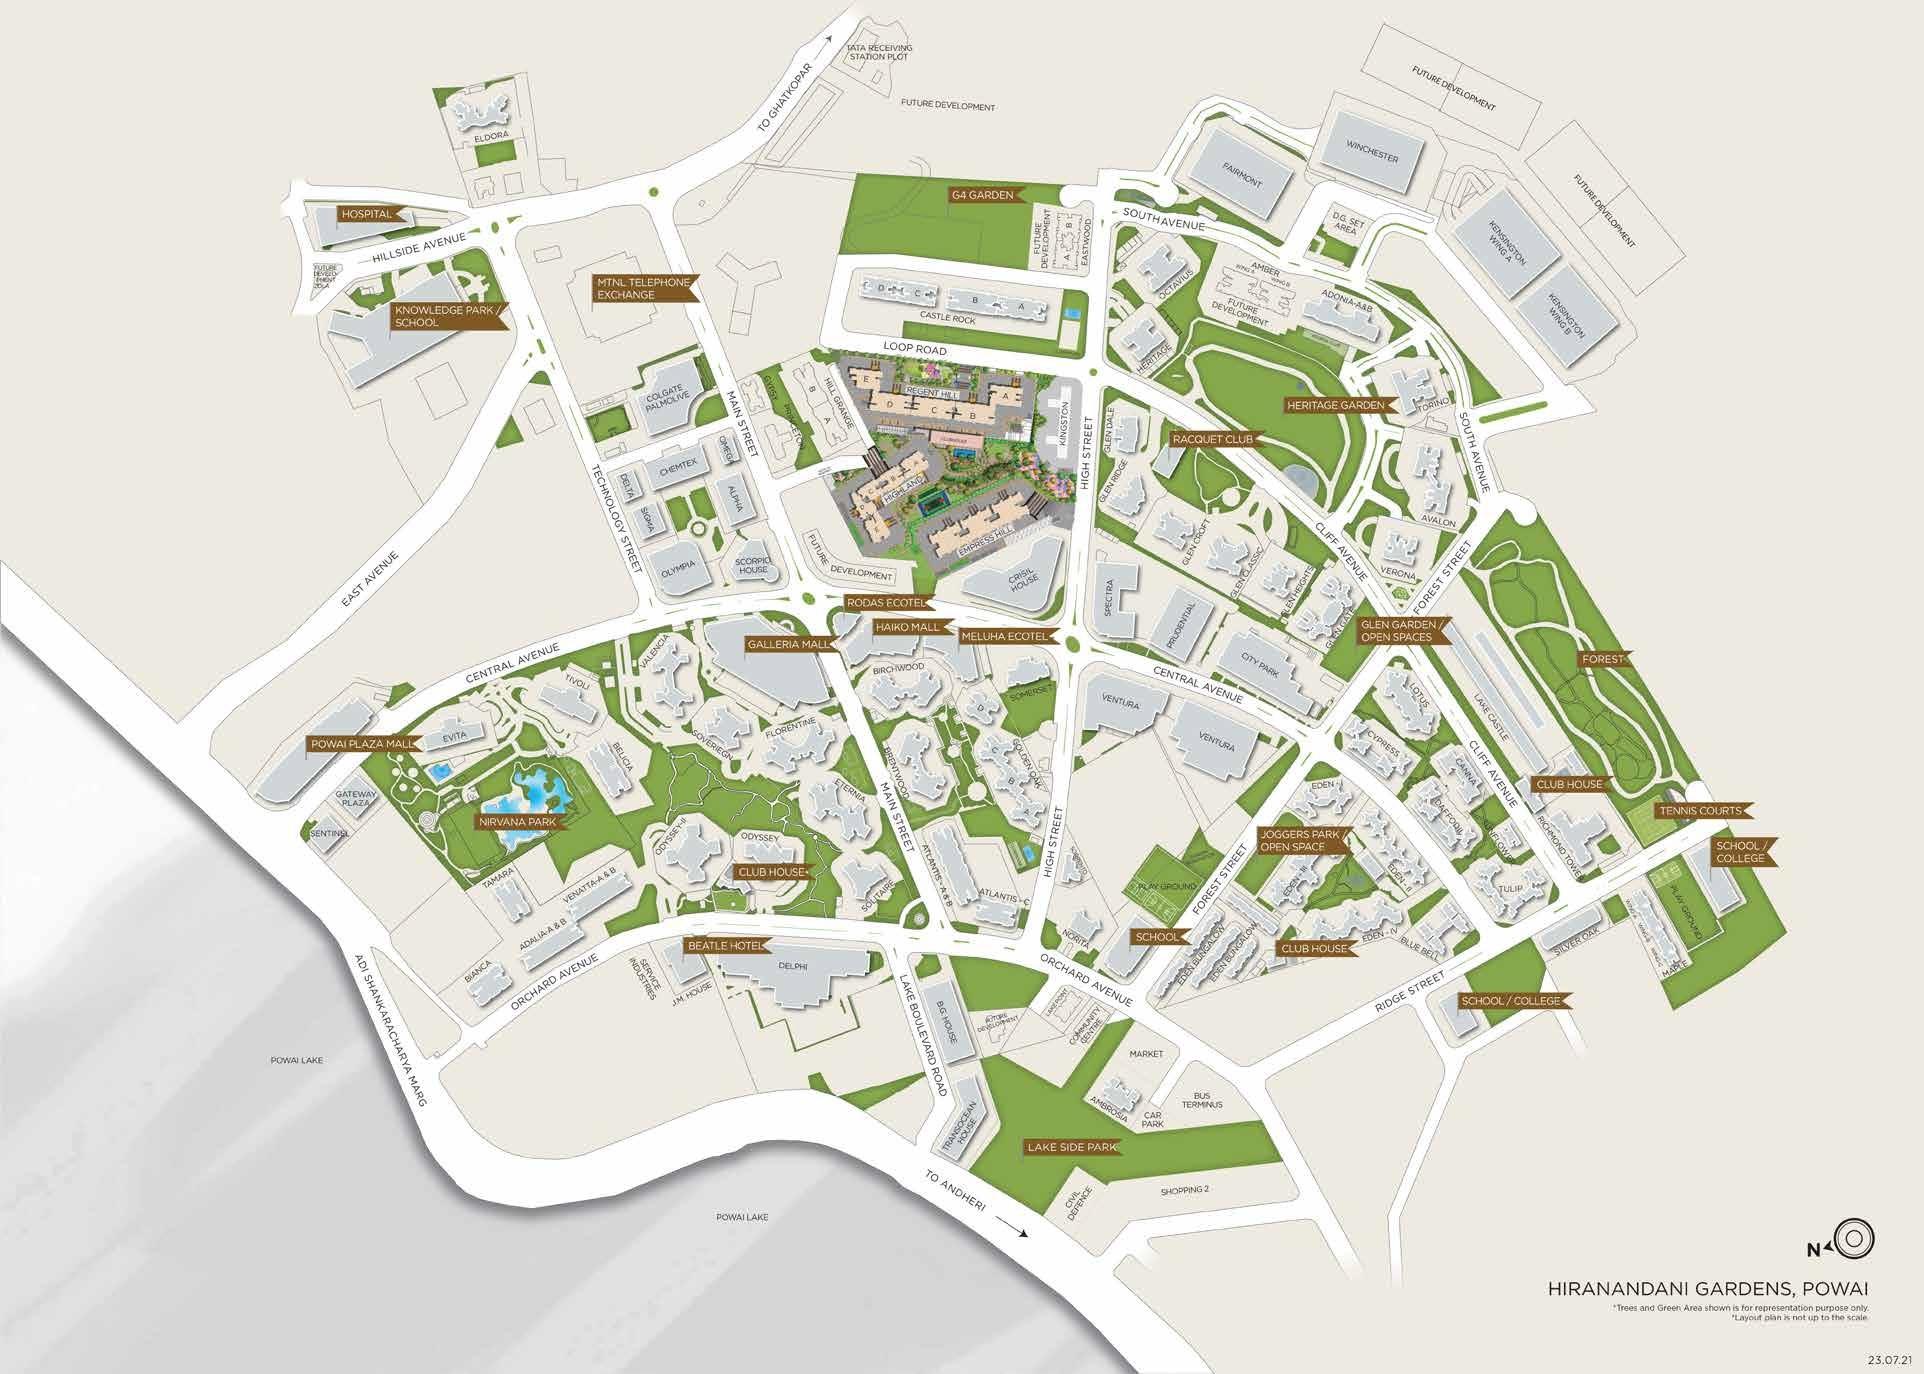 hiranandani glen dale project master plan image1